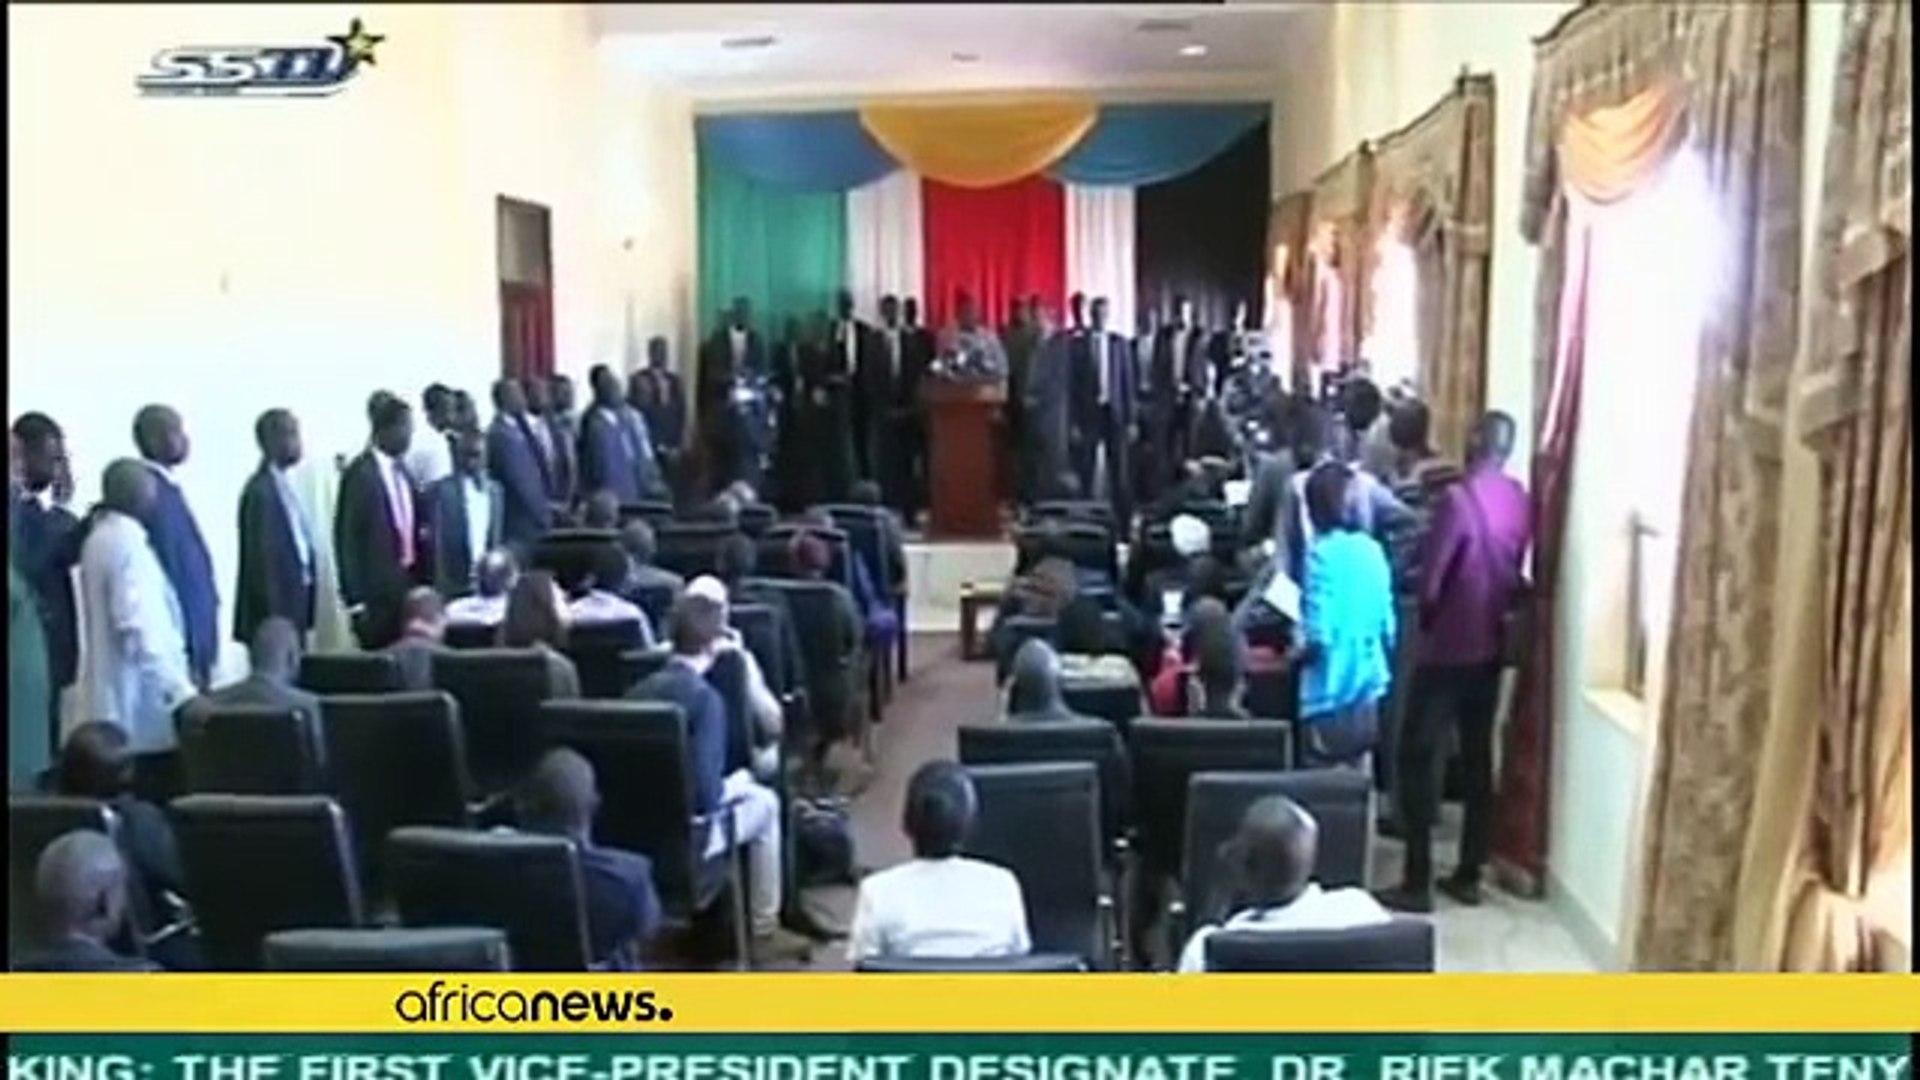 Machar flees South Sudan after botched assassination attempt